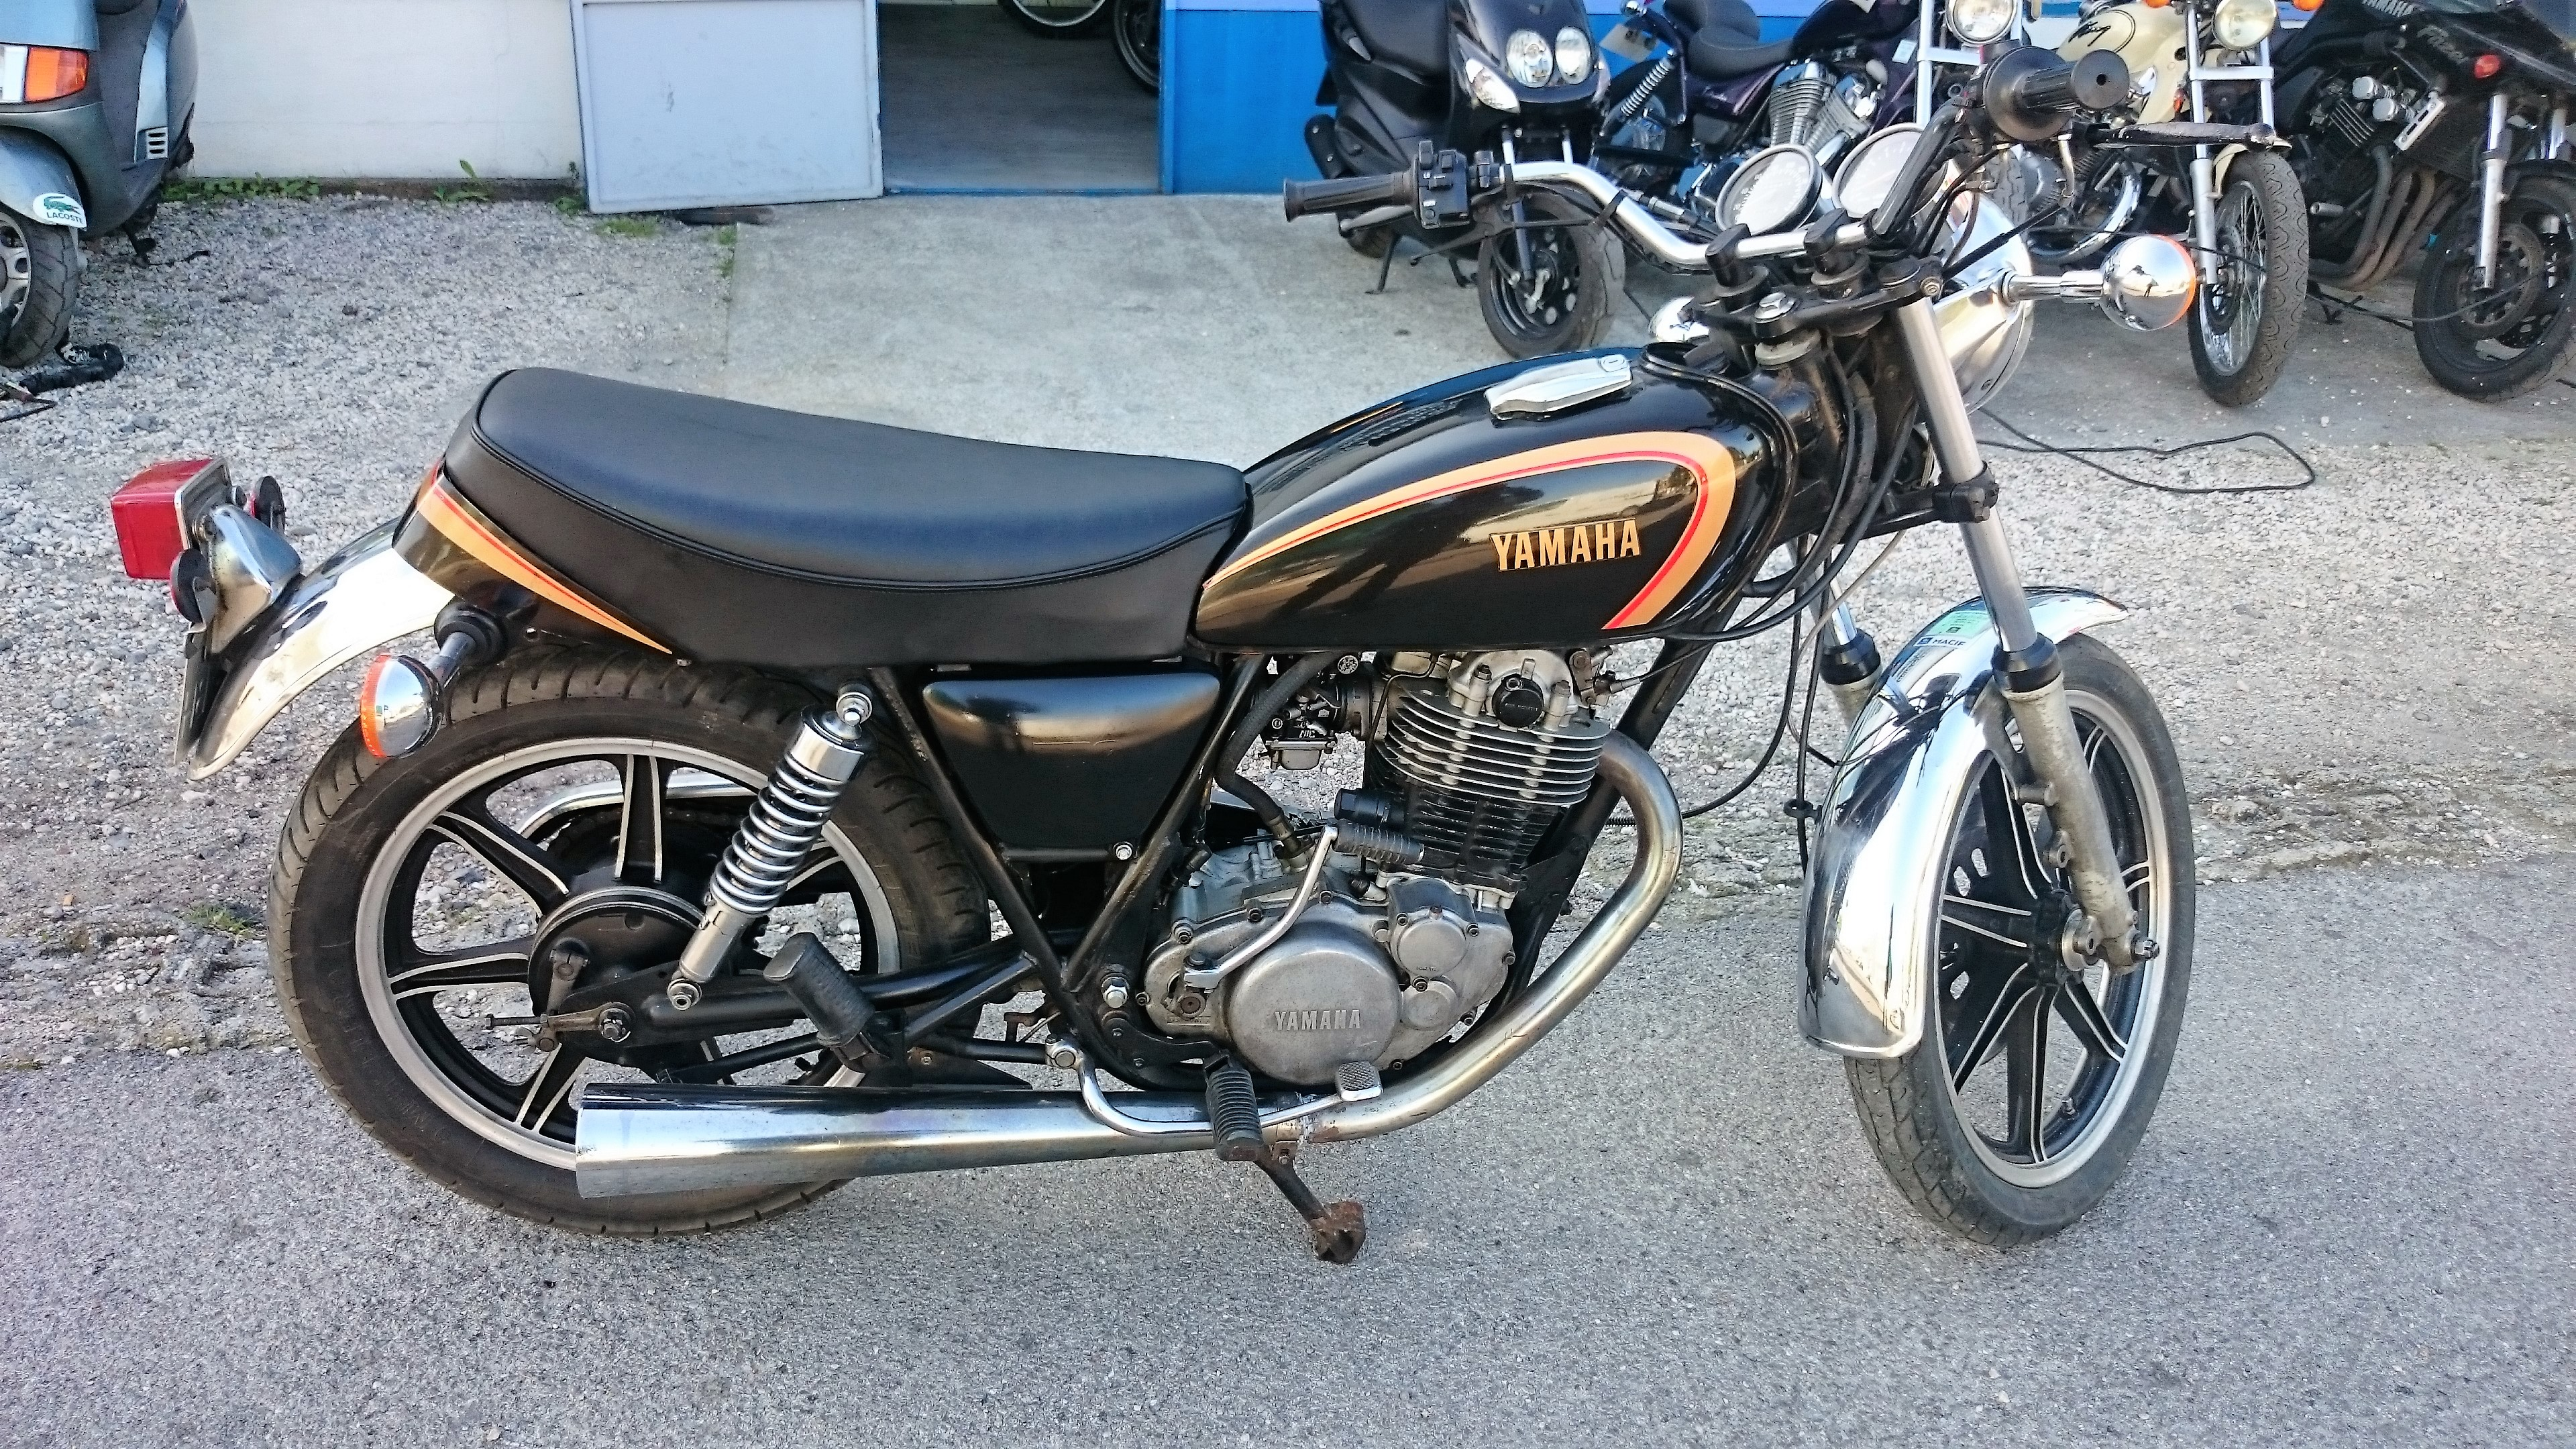 yamaha 500 sr yamaha team104 vente achat motos occasions vintage pi ces. Black Bedroom Furniture Sets. Home Design Ideas